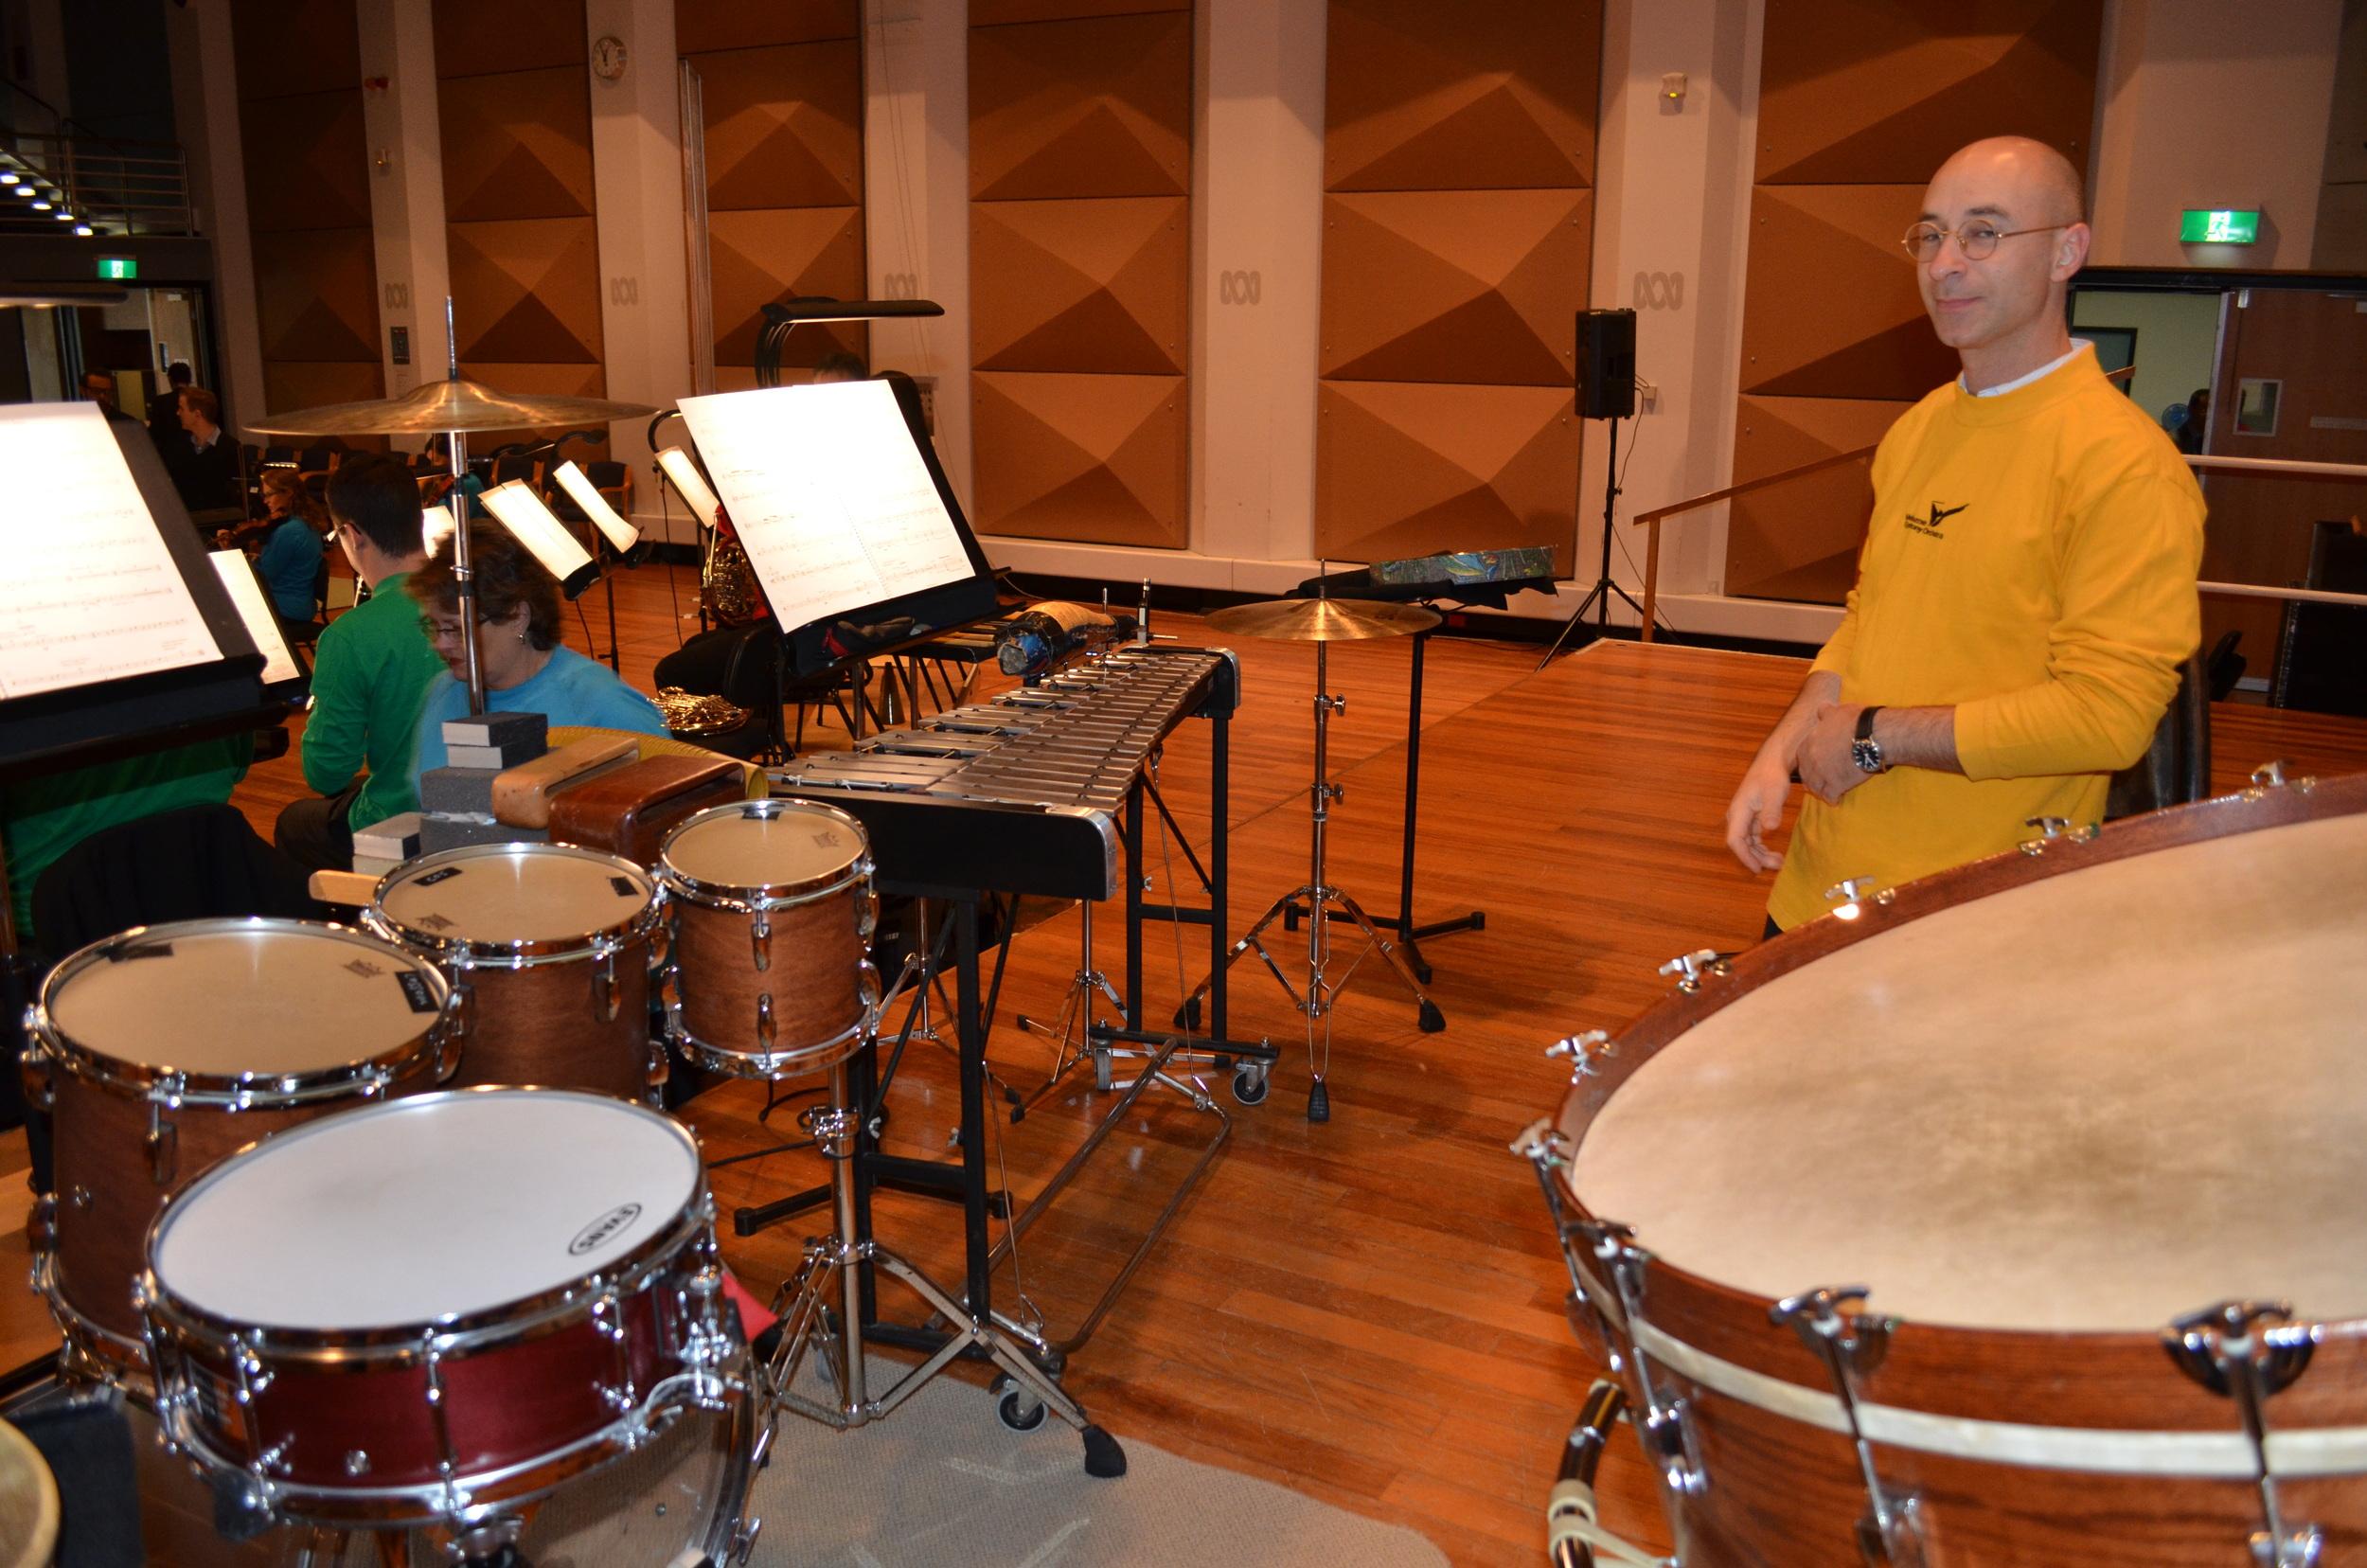 John Arcaro,MSO percussionist, with percussion setup